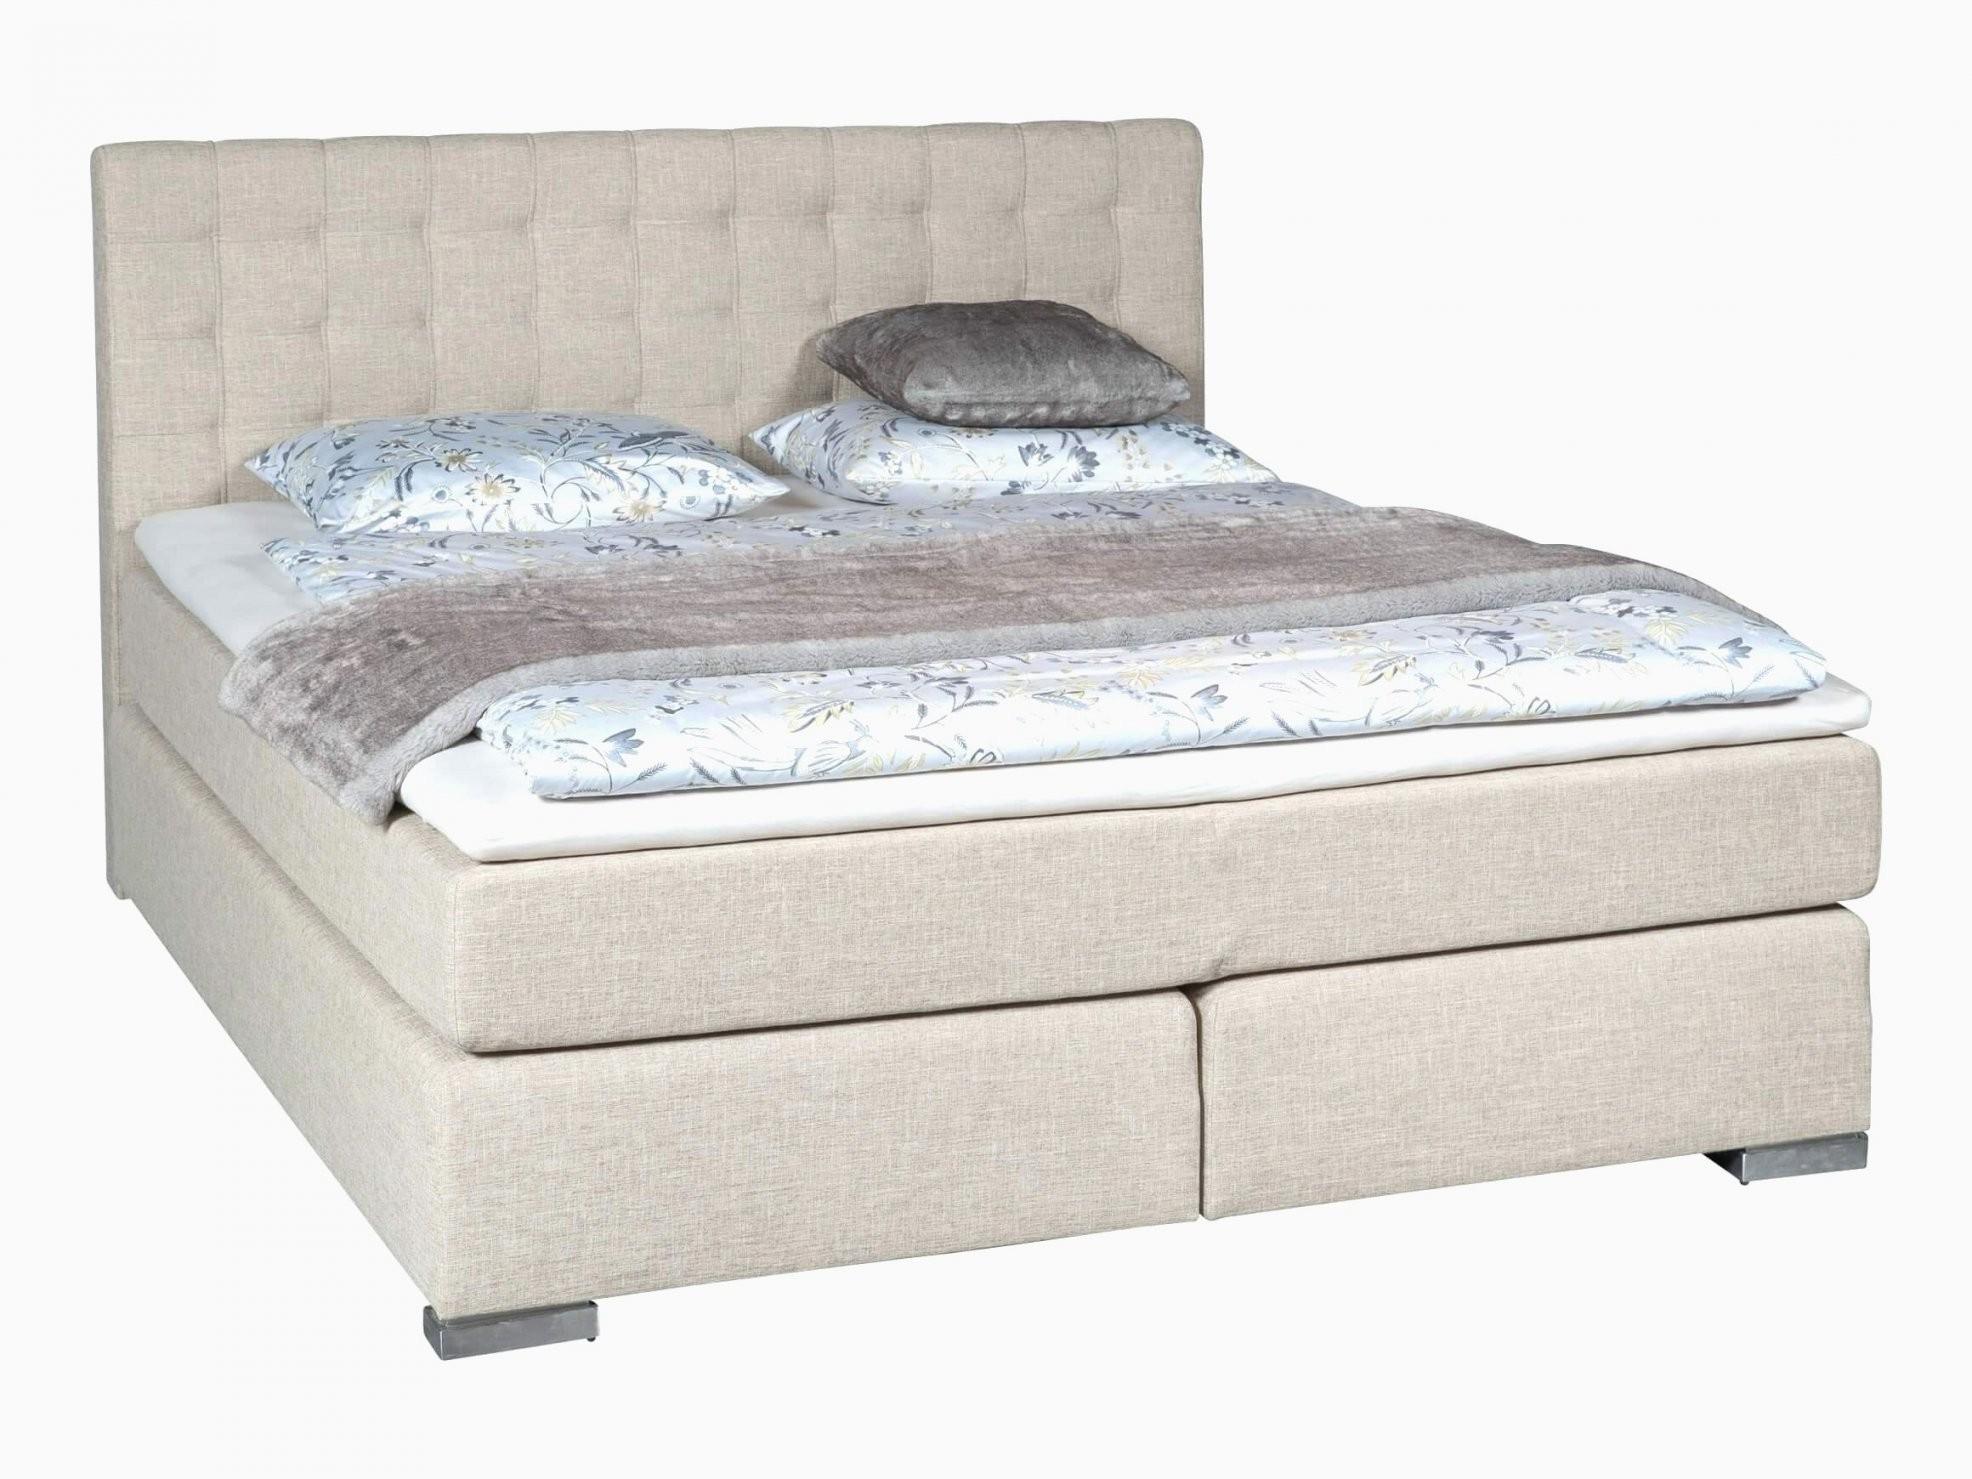 Molton Hoeslaken Ikea Simplistisch Bett 180X200 Ikea Latest von Ikea Bett Weiß 180X200 Photo